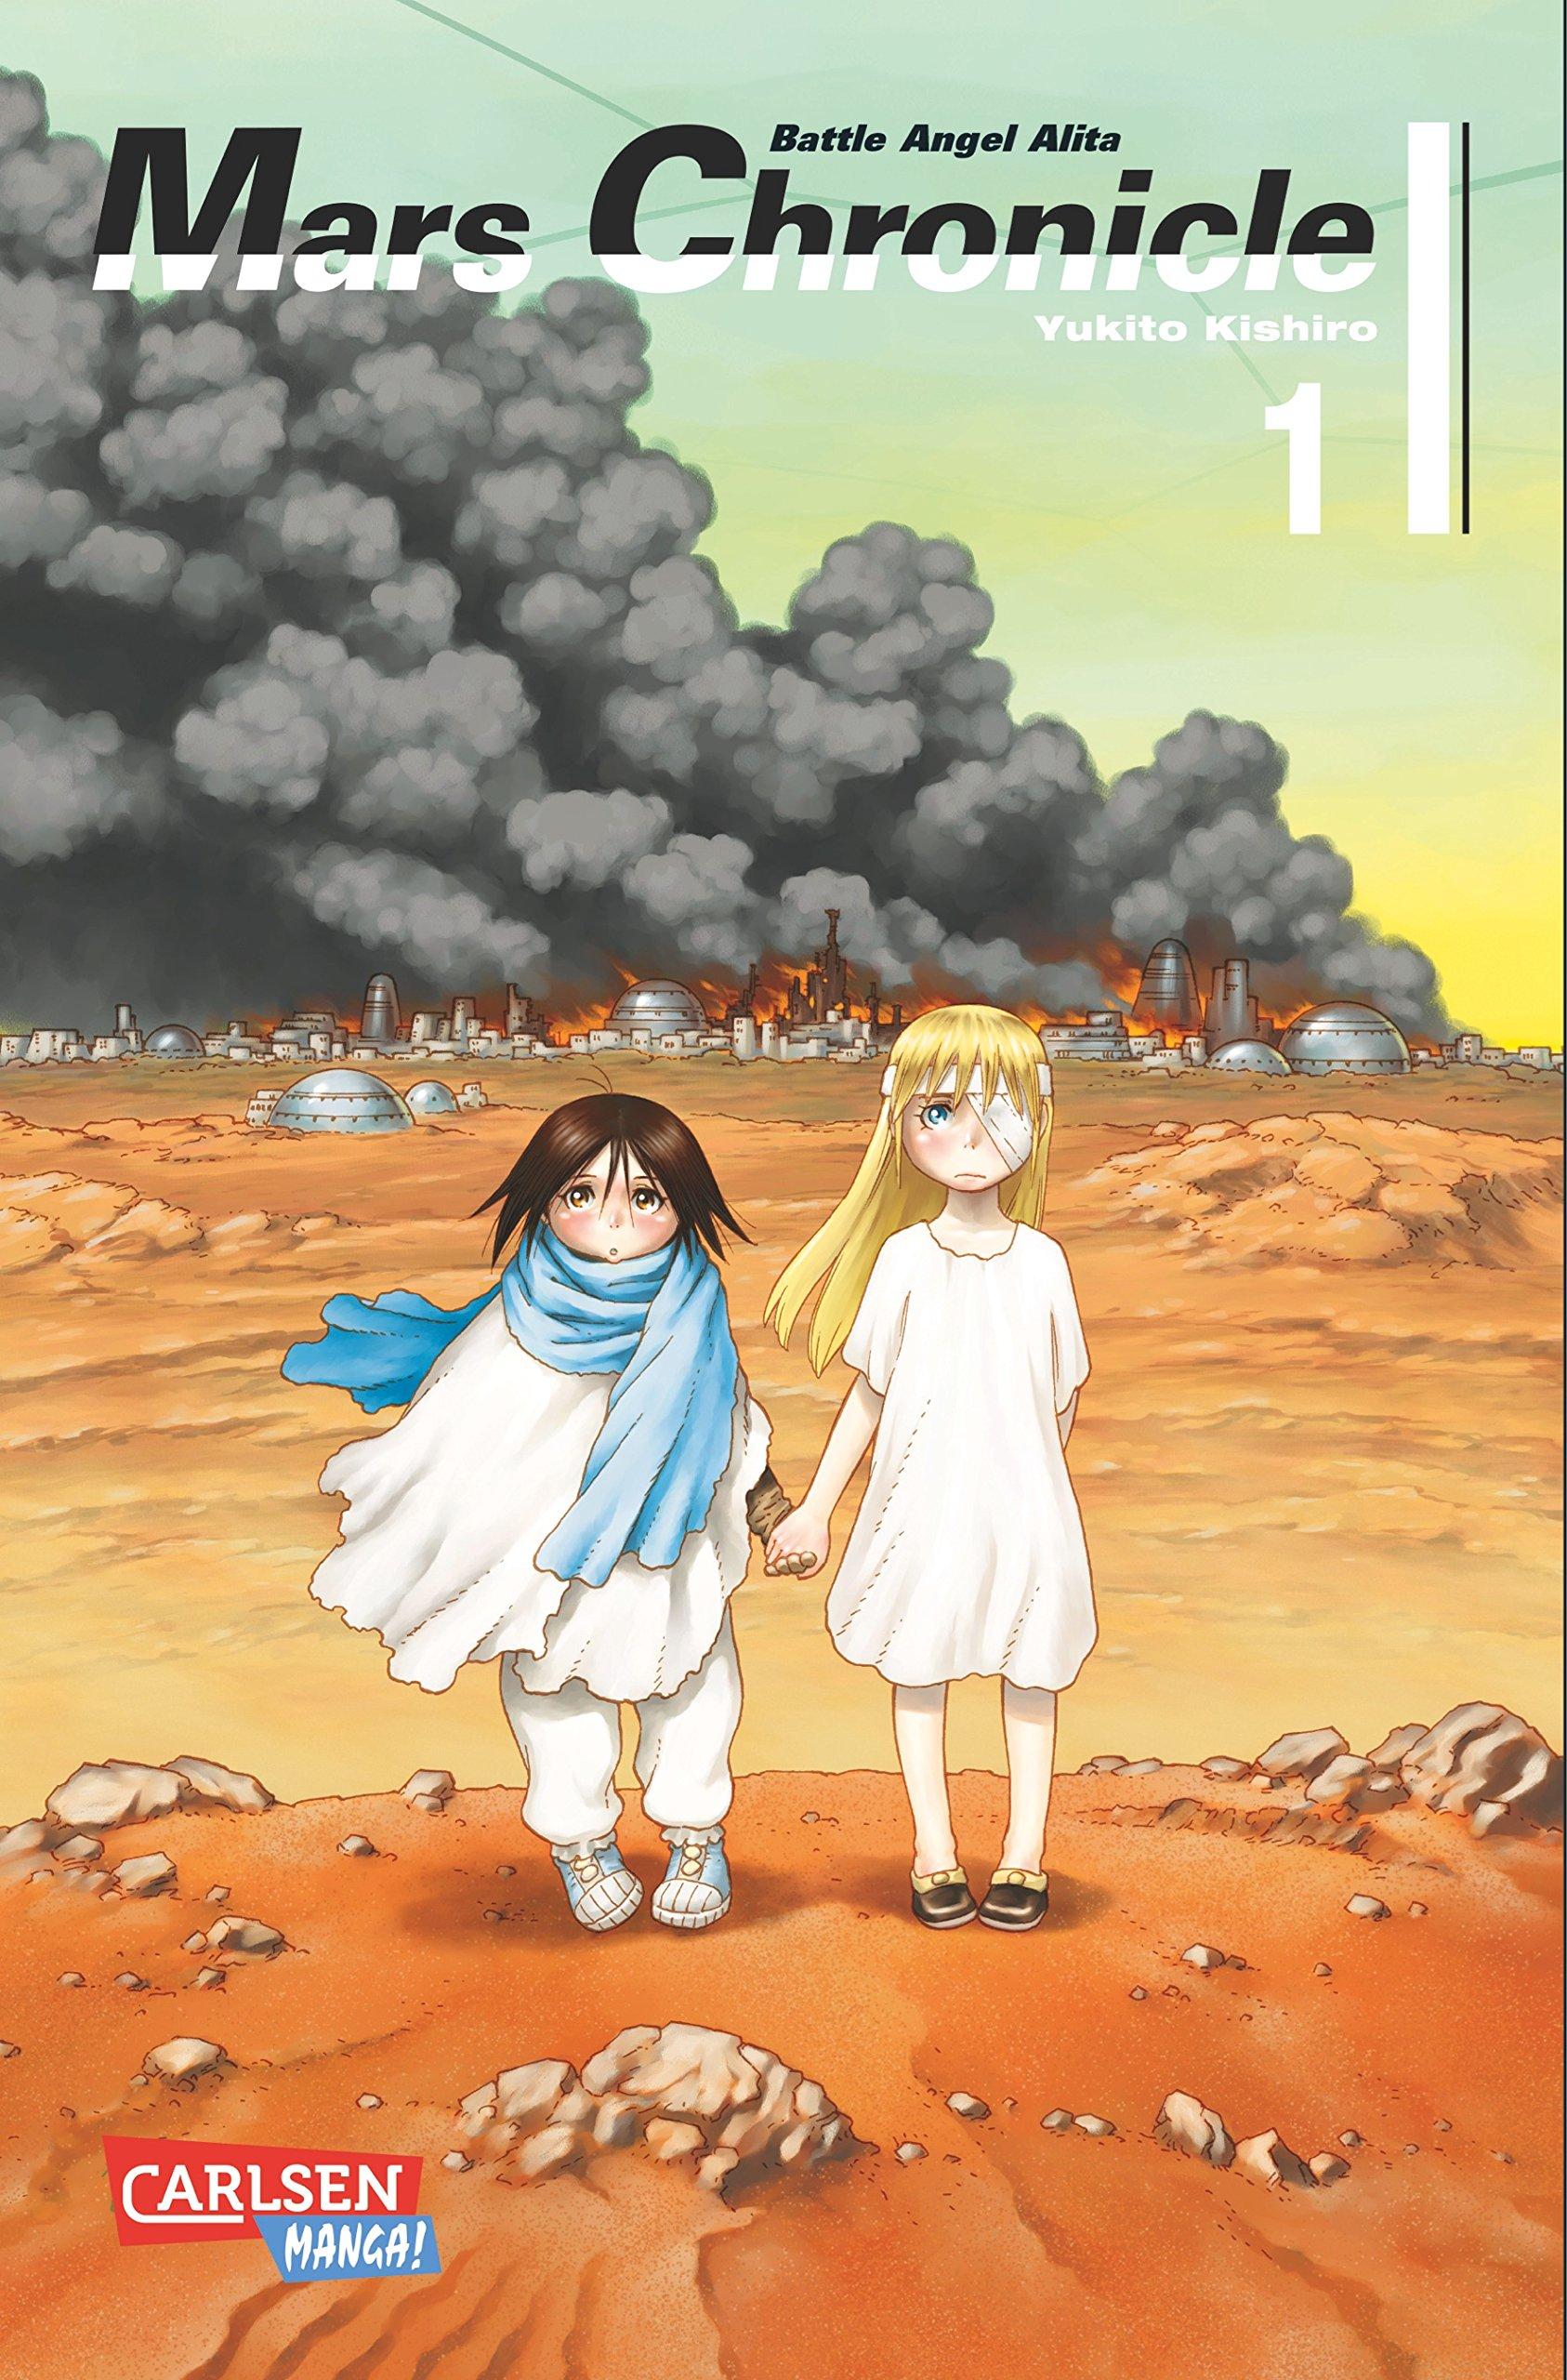 Battle Angel Alita - Mars Chronicle 1 Taschenbuch – 30. Mai 2016 Yukito Kishiro Carlsen 3551761752 Manga / Action